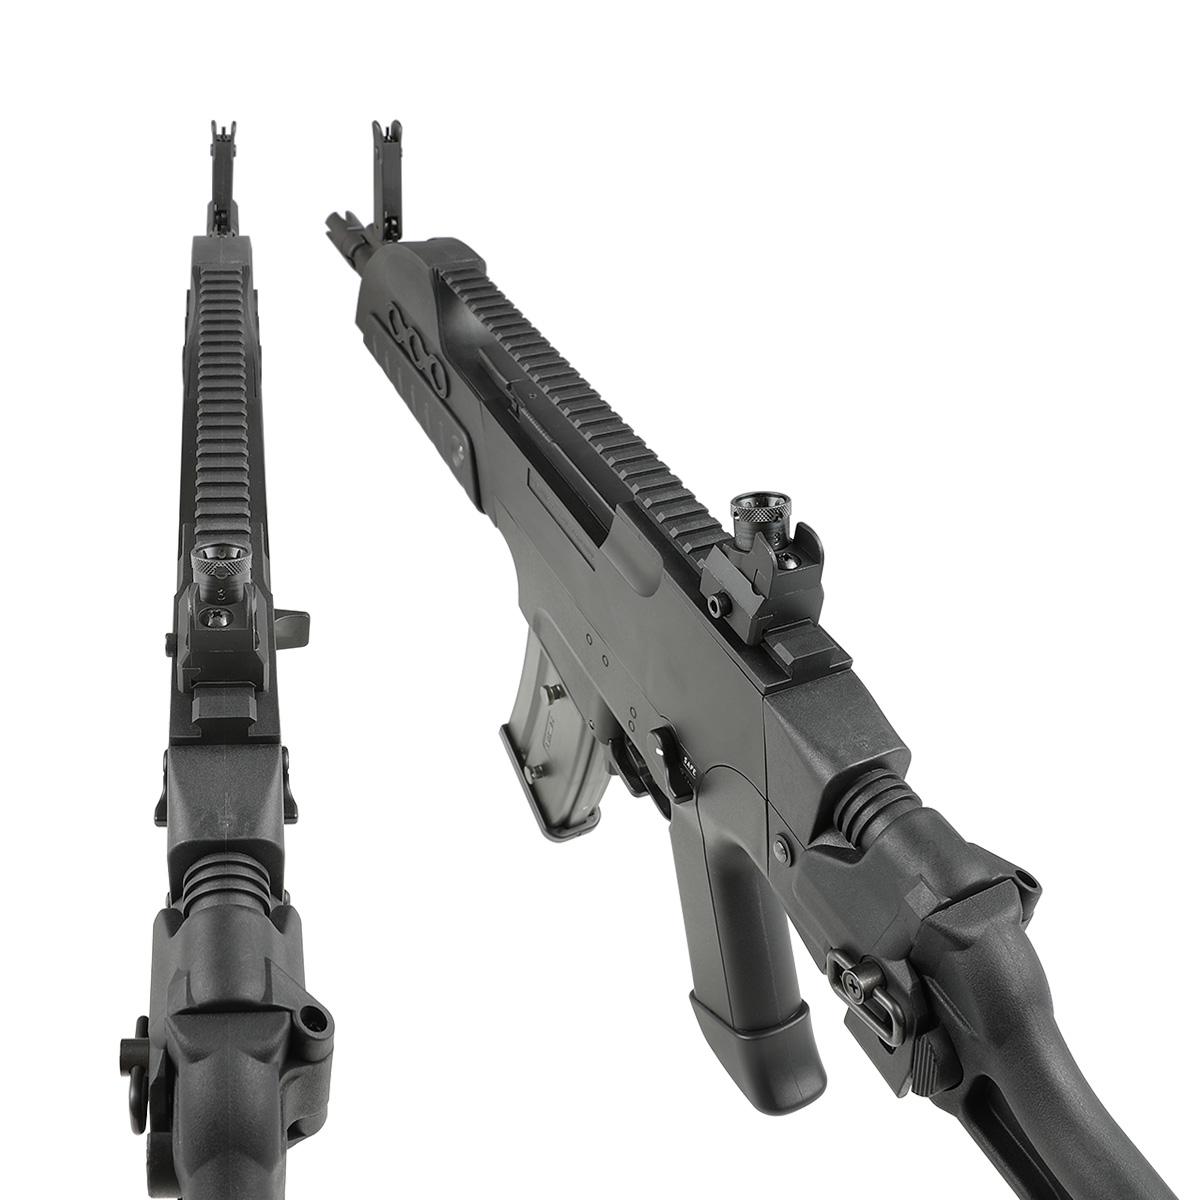 【同梱不可】 SRC H&K XM8-CU フルサイズ電動ガン NV Black (JP Ver.) 【配送業者:佐川急便限定】